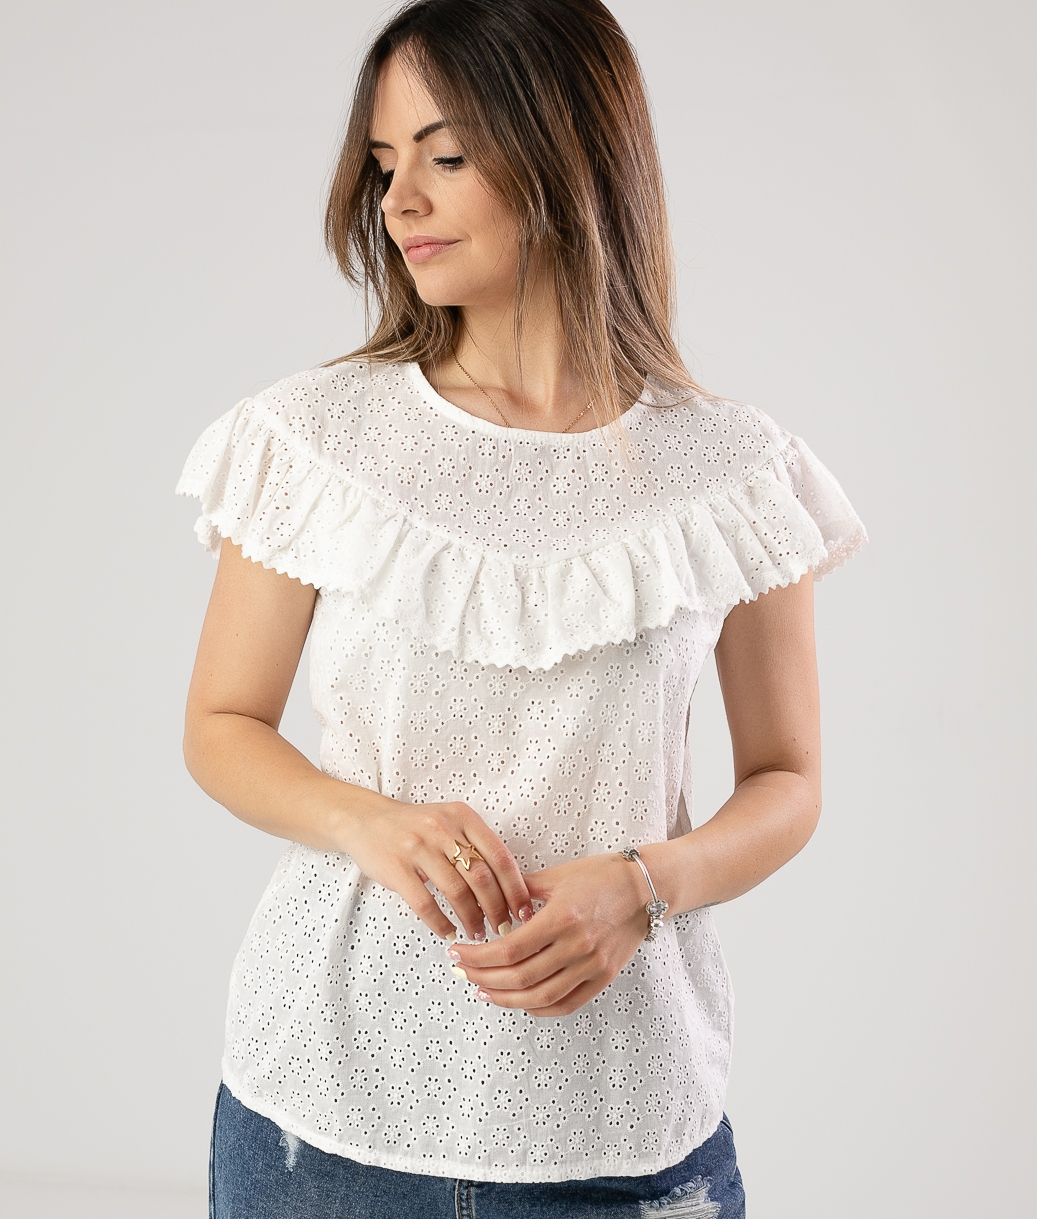 Blusa Viento - Blanco